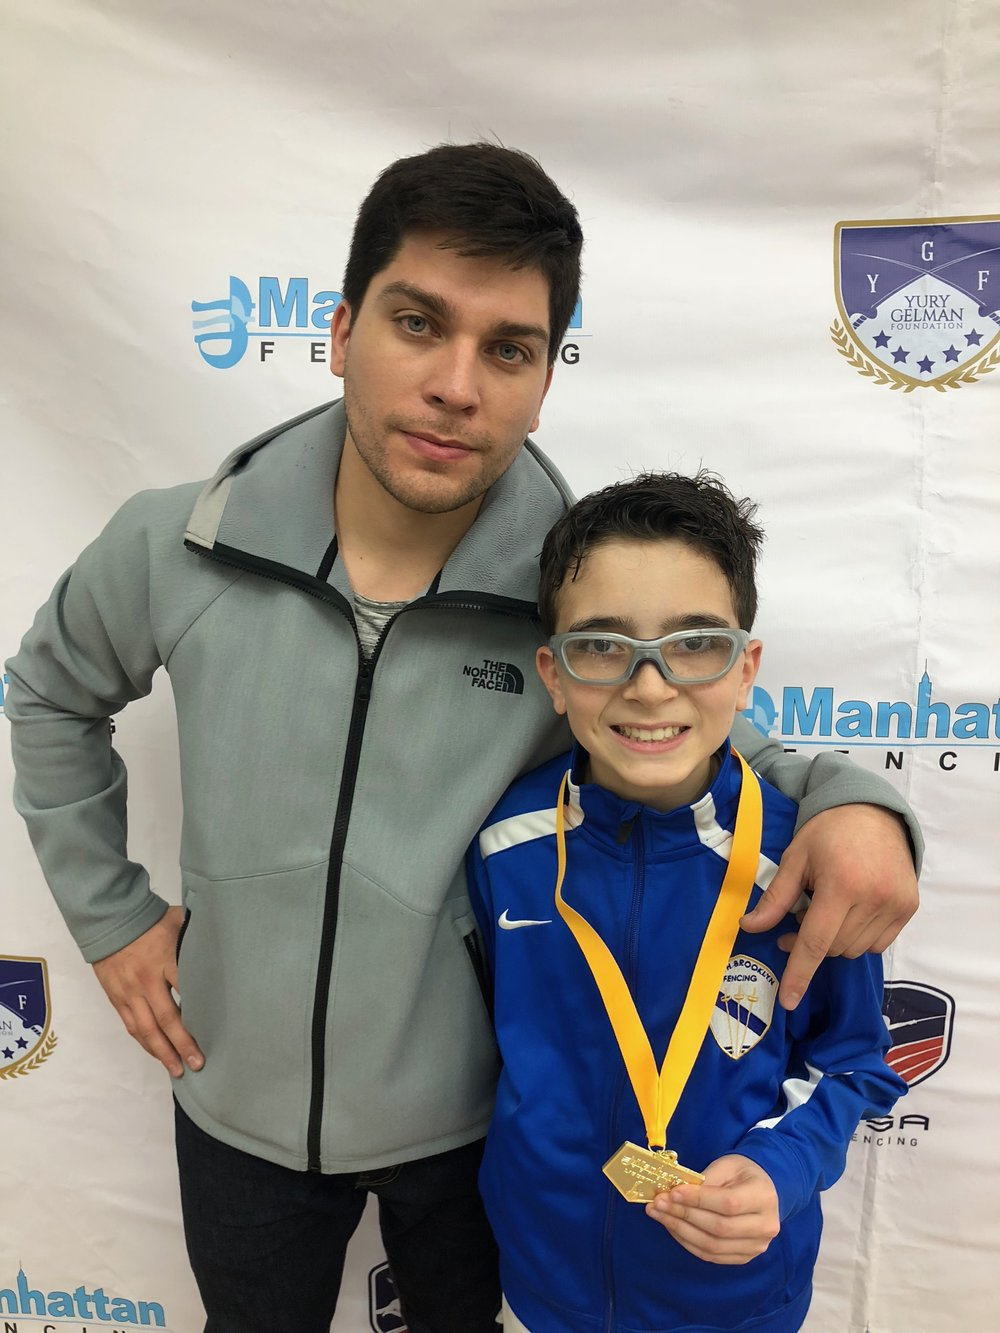 Manhattan Fencing Center Youth    Sebastian Garcia 1st place men's  December 2nd 2018